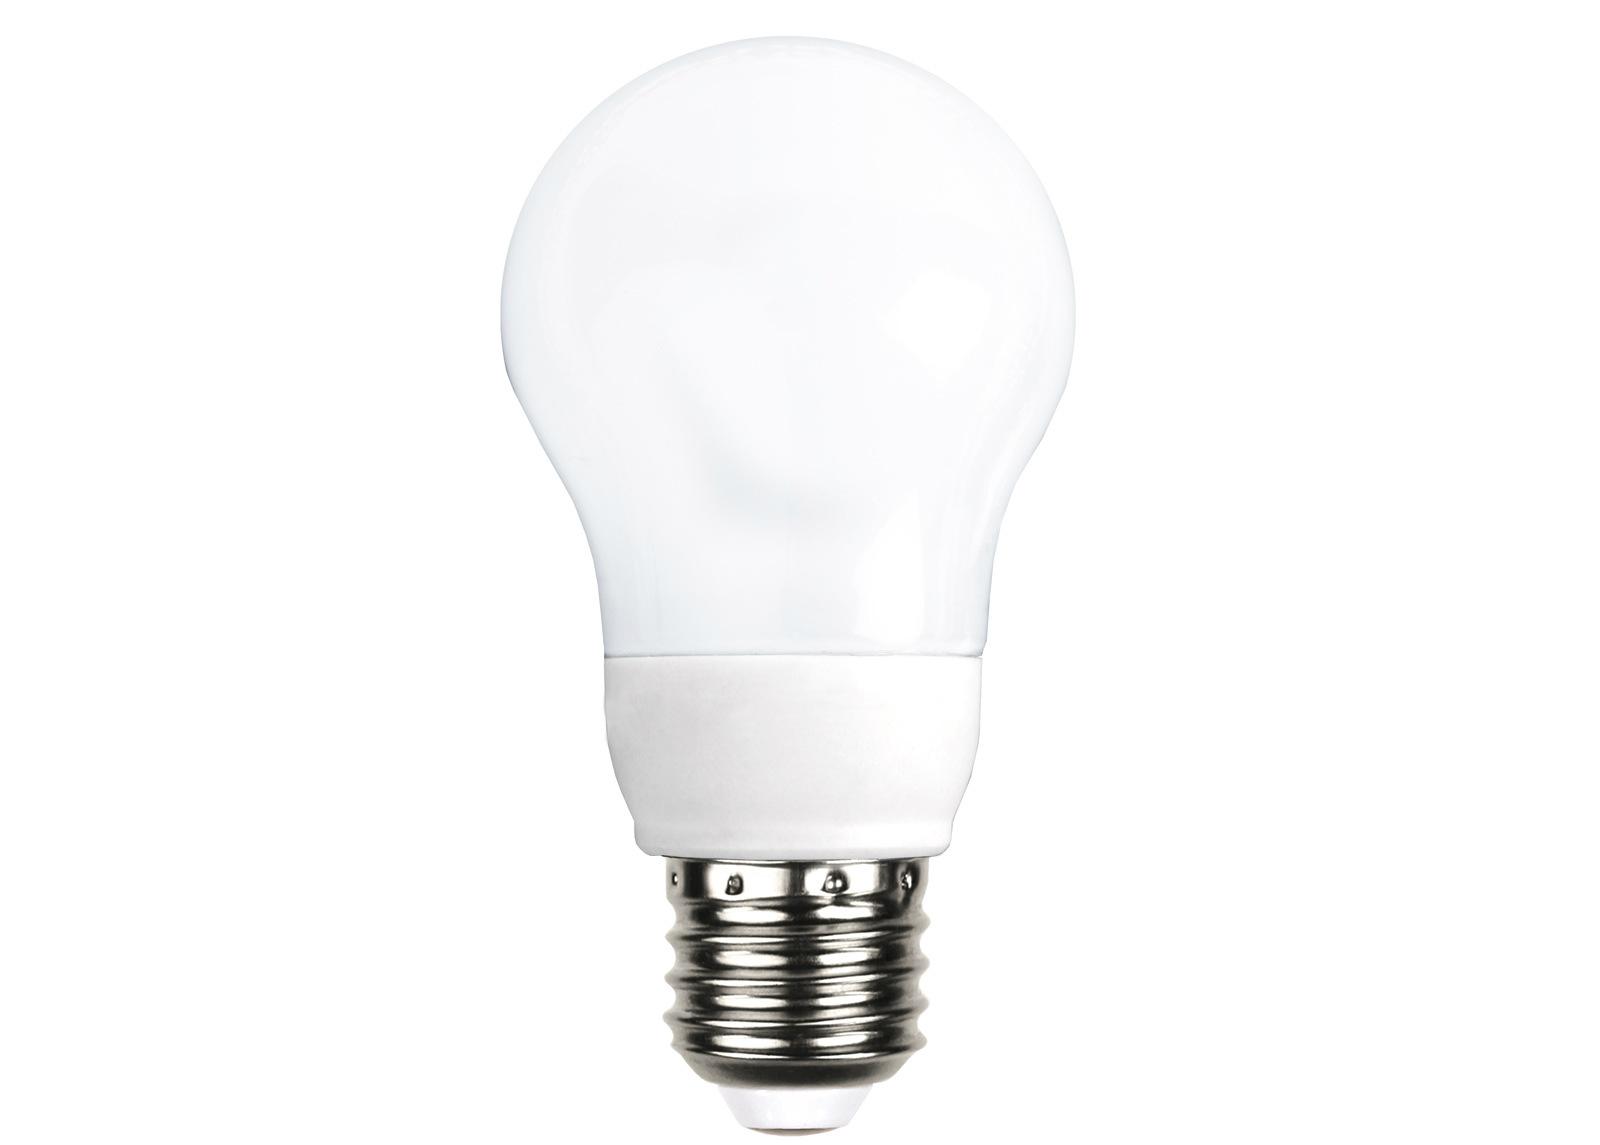 LED sähkölamppu E27 5,0 W (35 W)